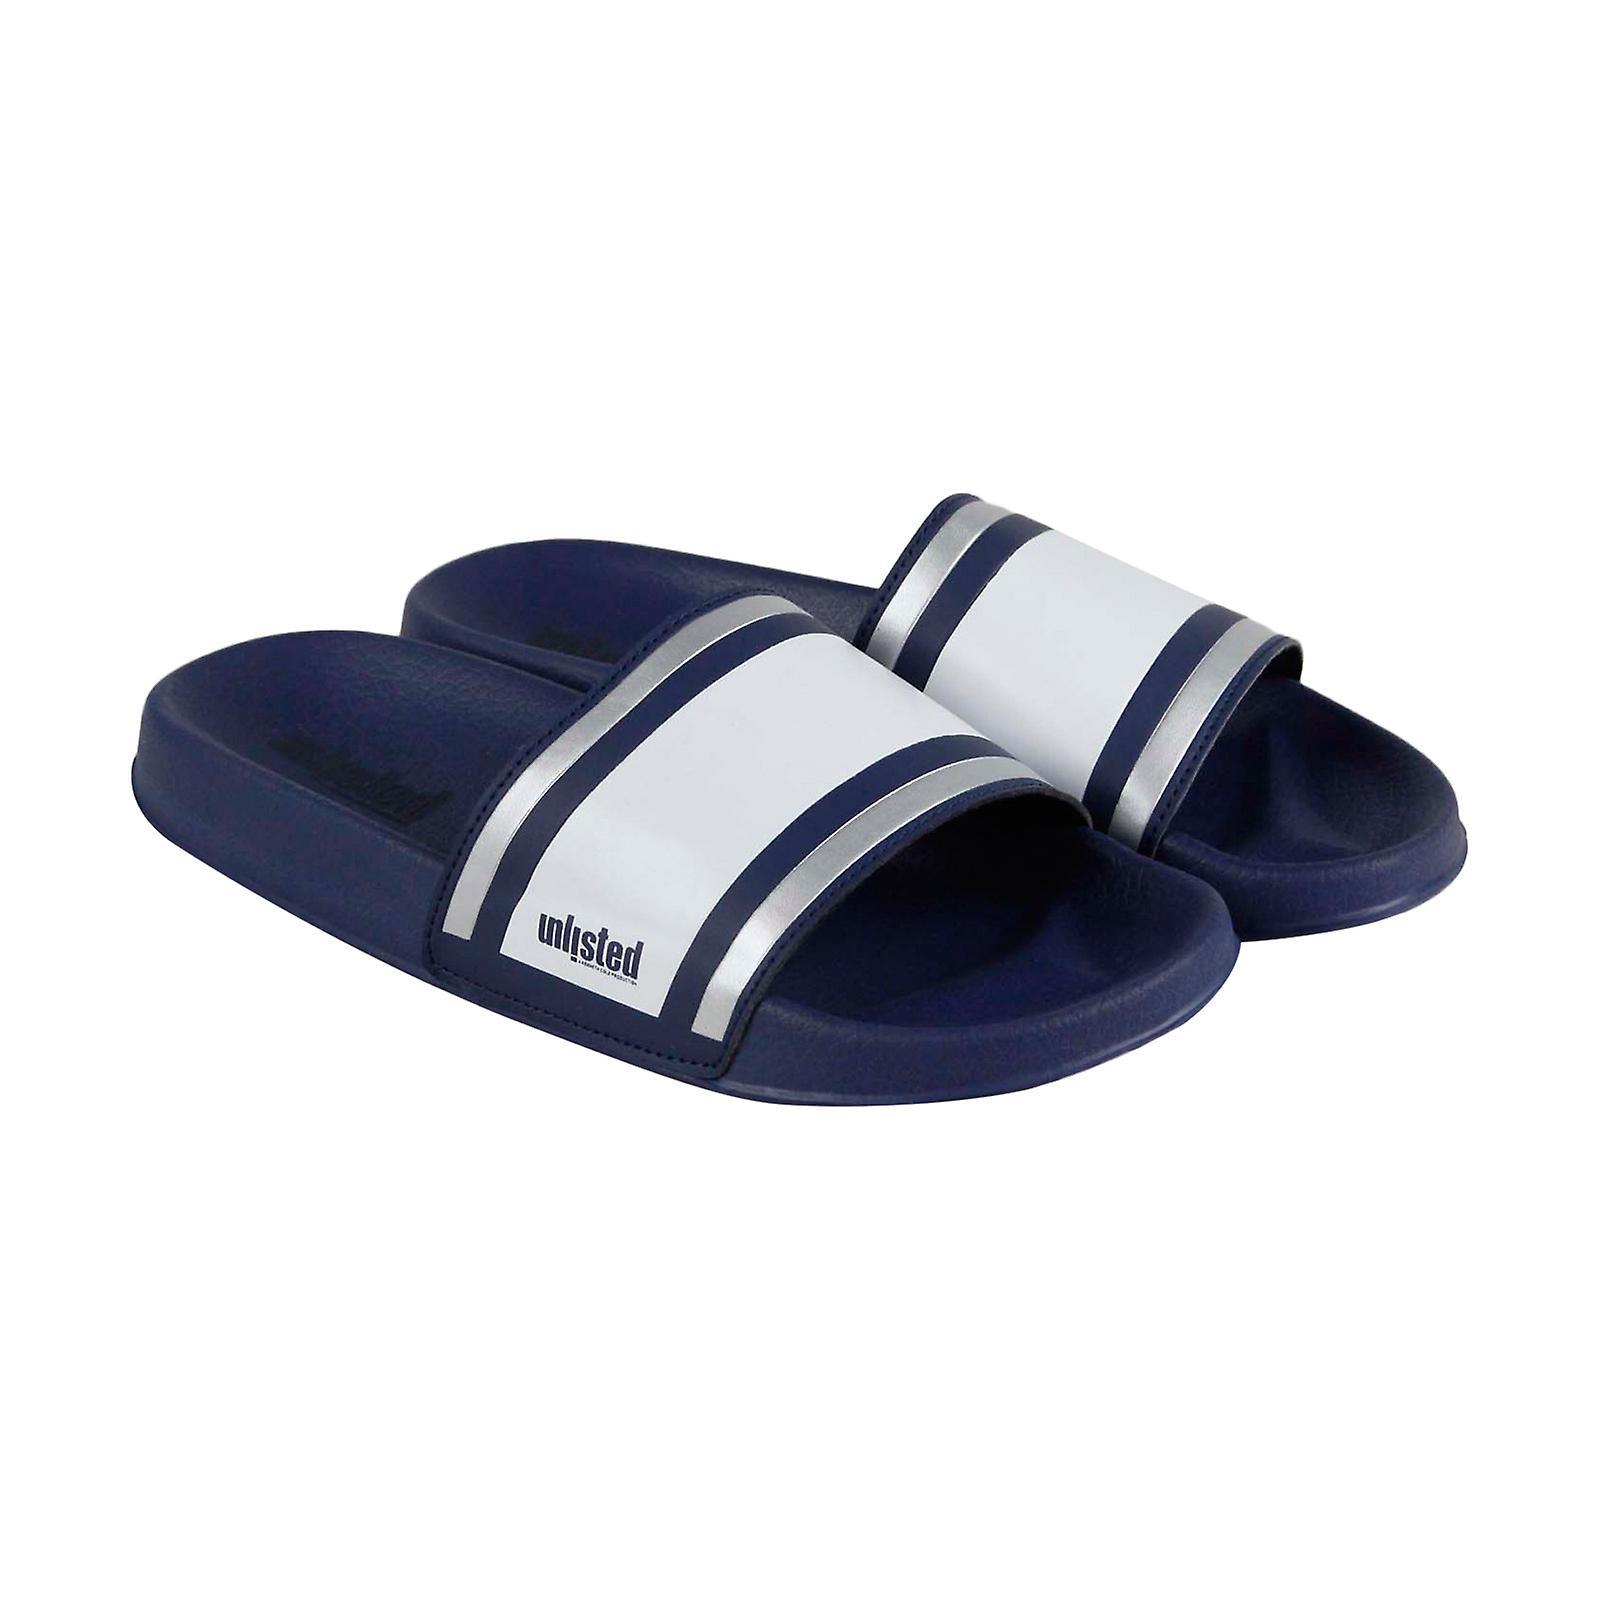 Kenneth Blue Cole Unlisted Form Sandal Mens Blue Kenneth Flip Flops Sandals Shoes 9c3cc2